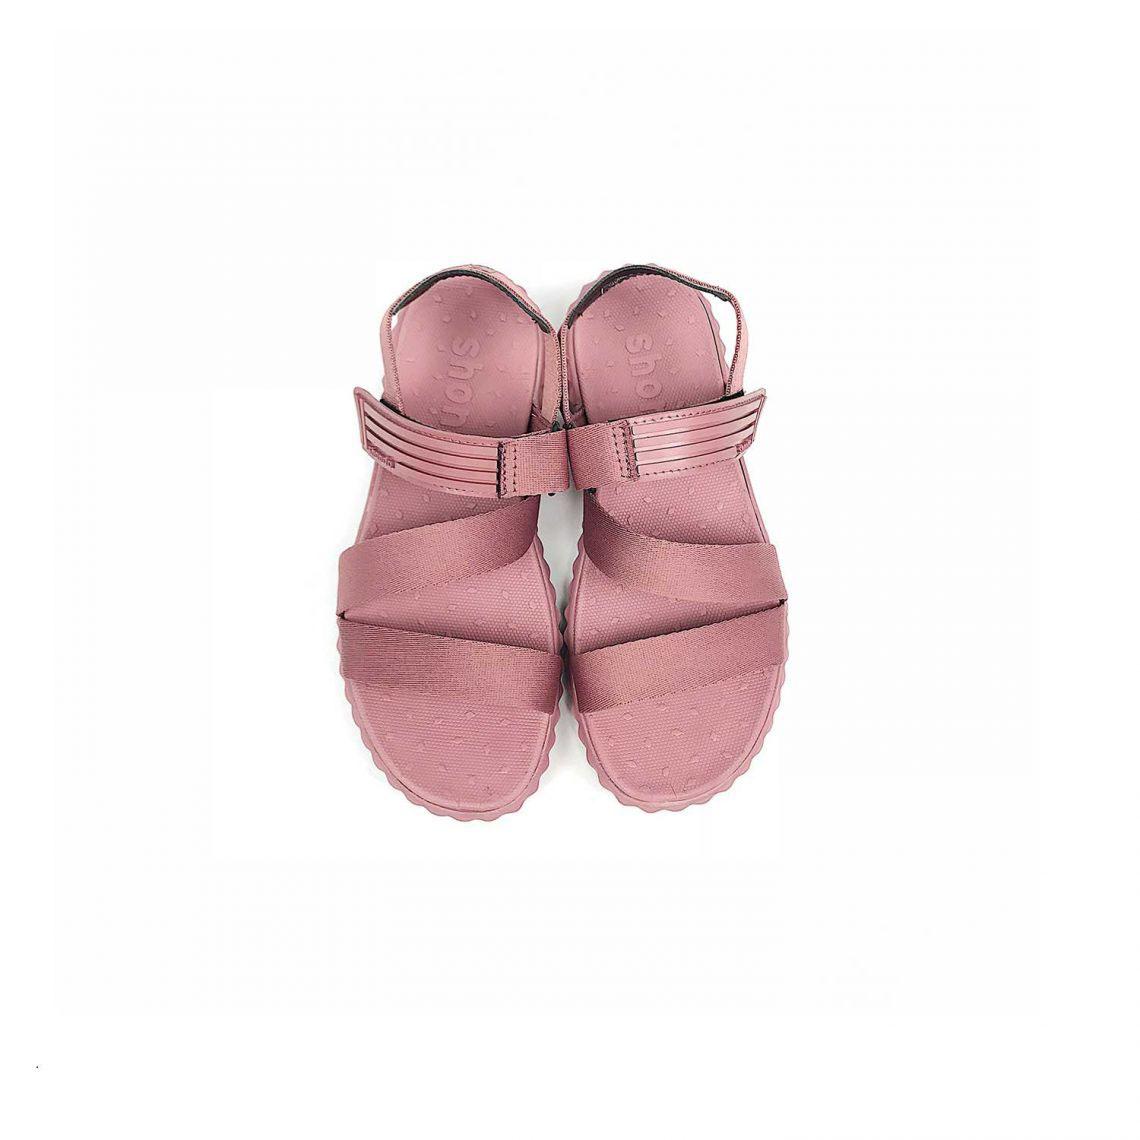 Giày Sandals SHONDO F6 F6M203 2